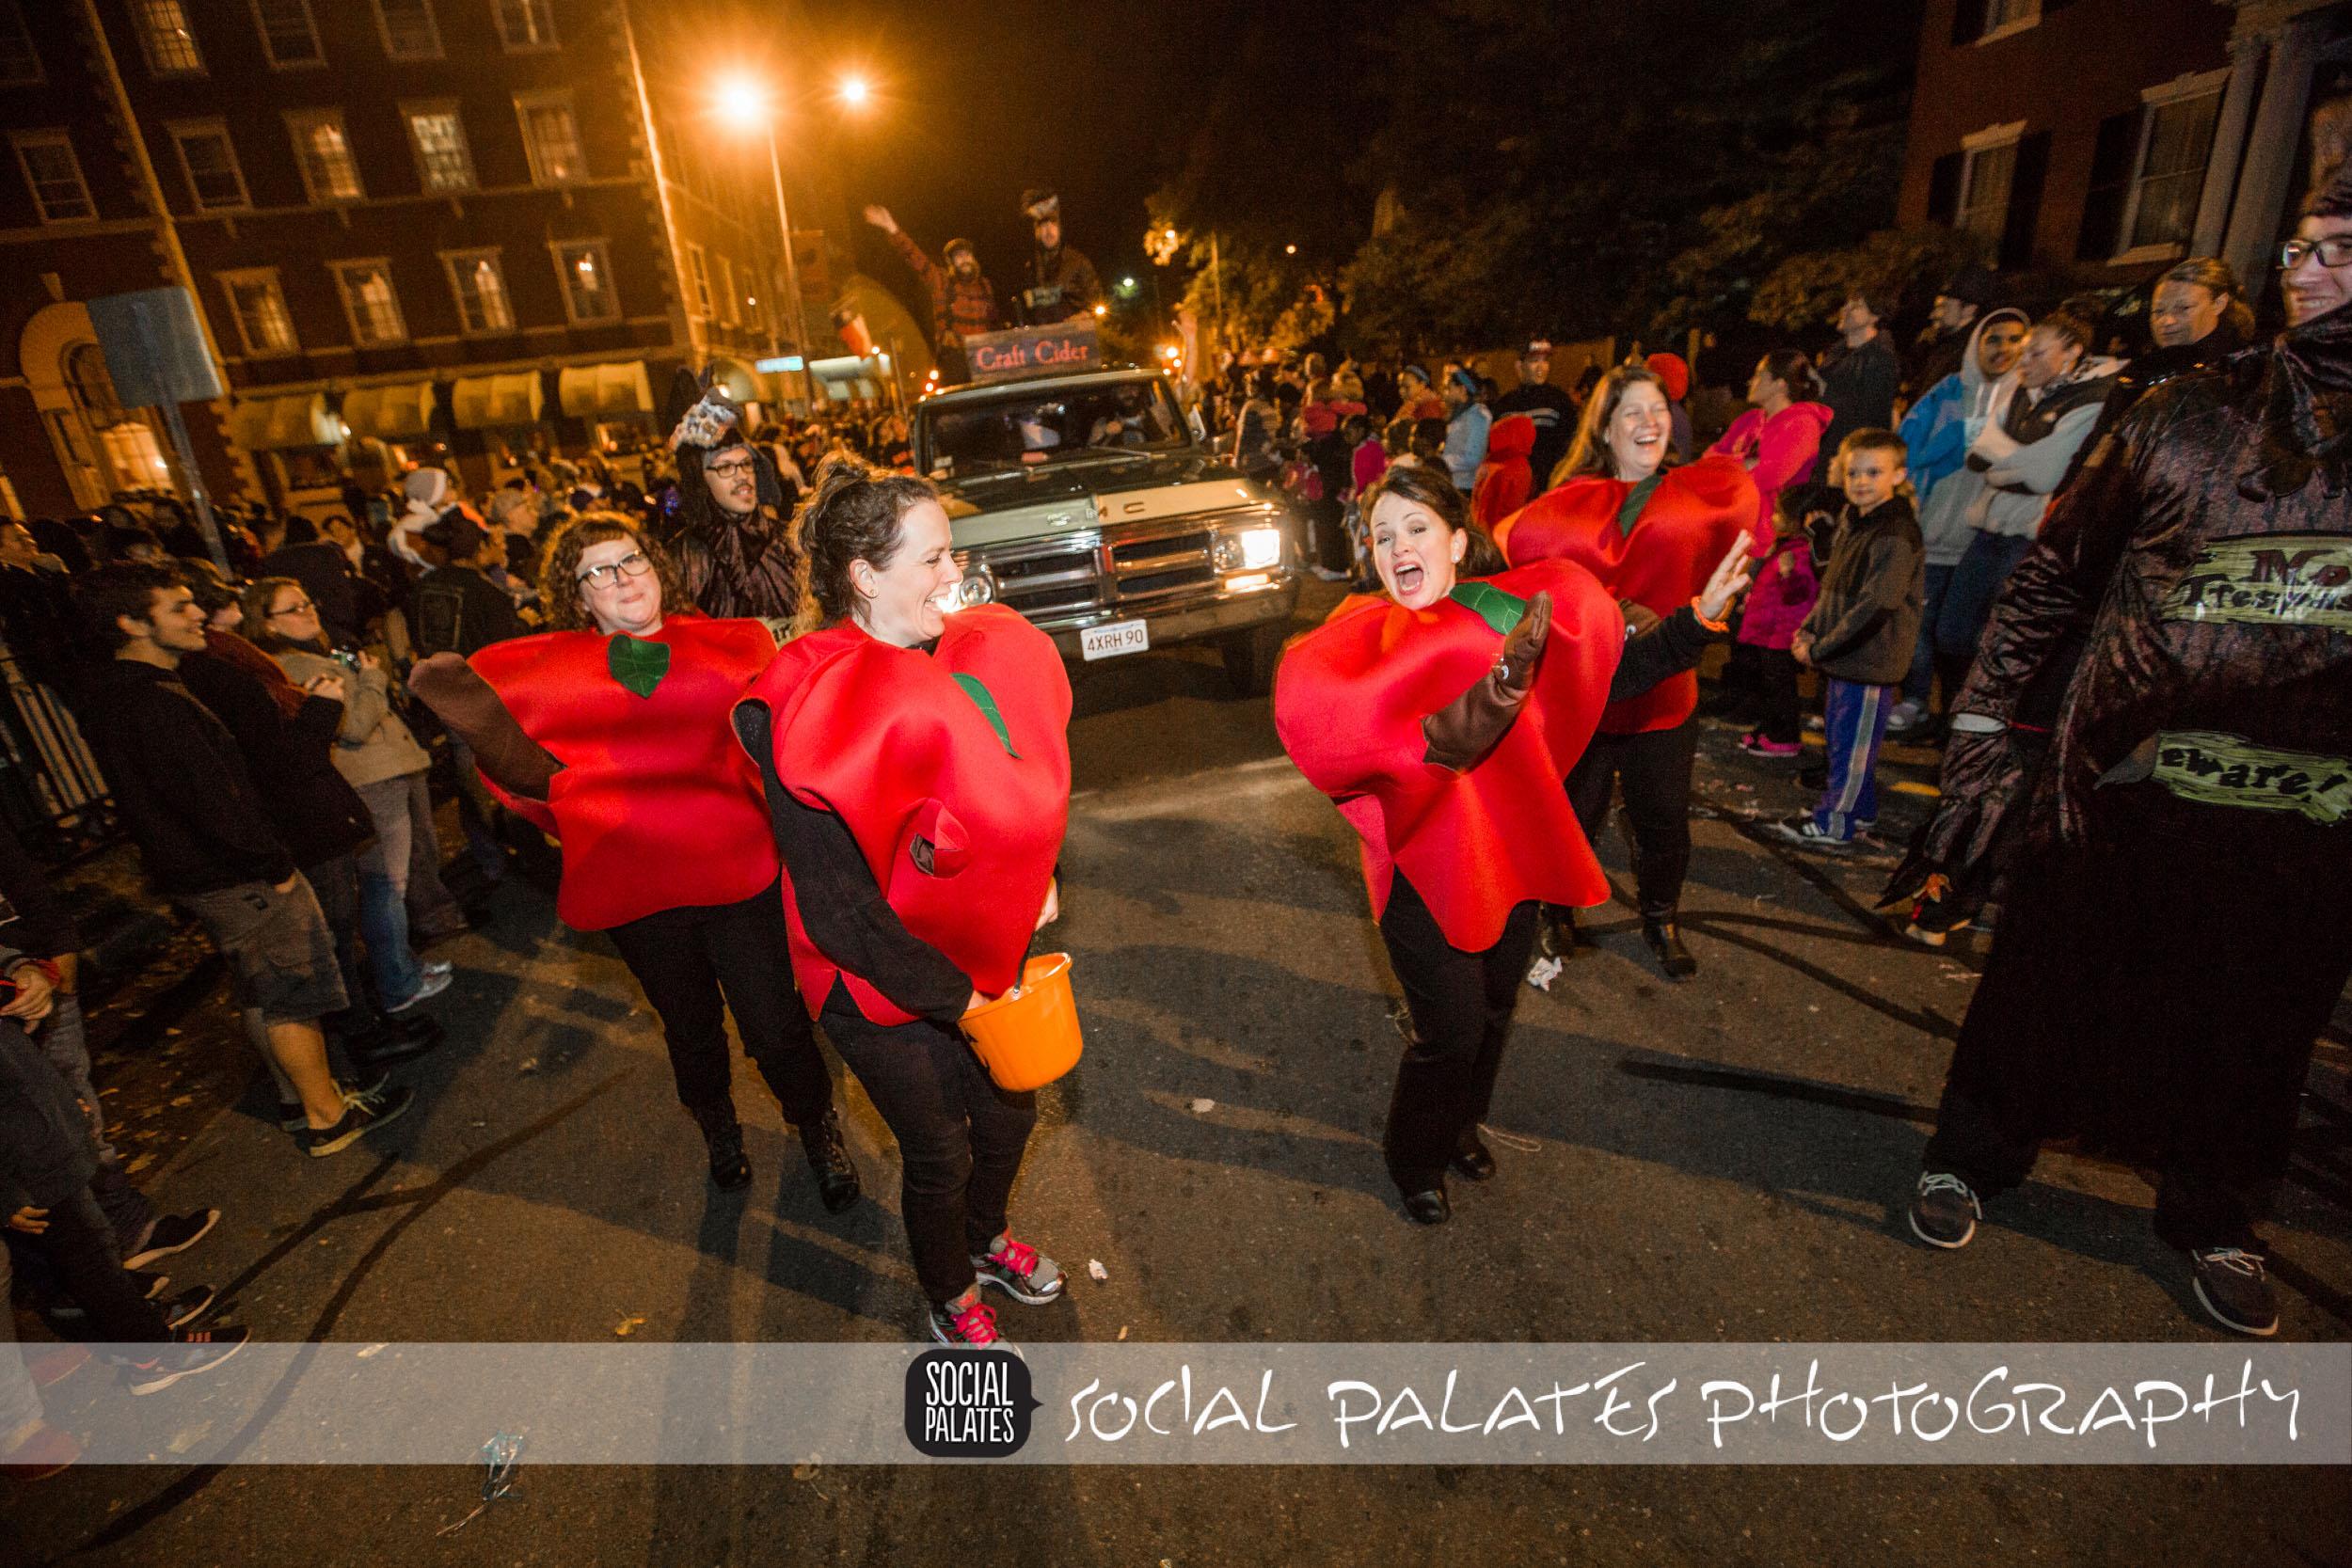 Haunted Happenings Parade 2014 Creative Salem by Social Palates-7898.jpg